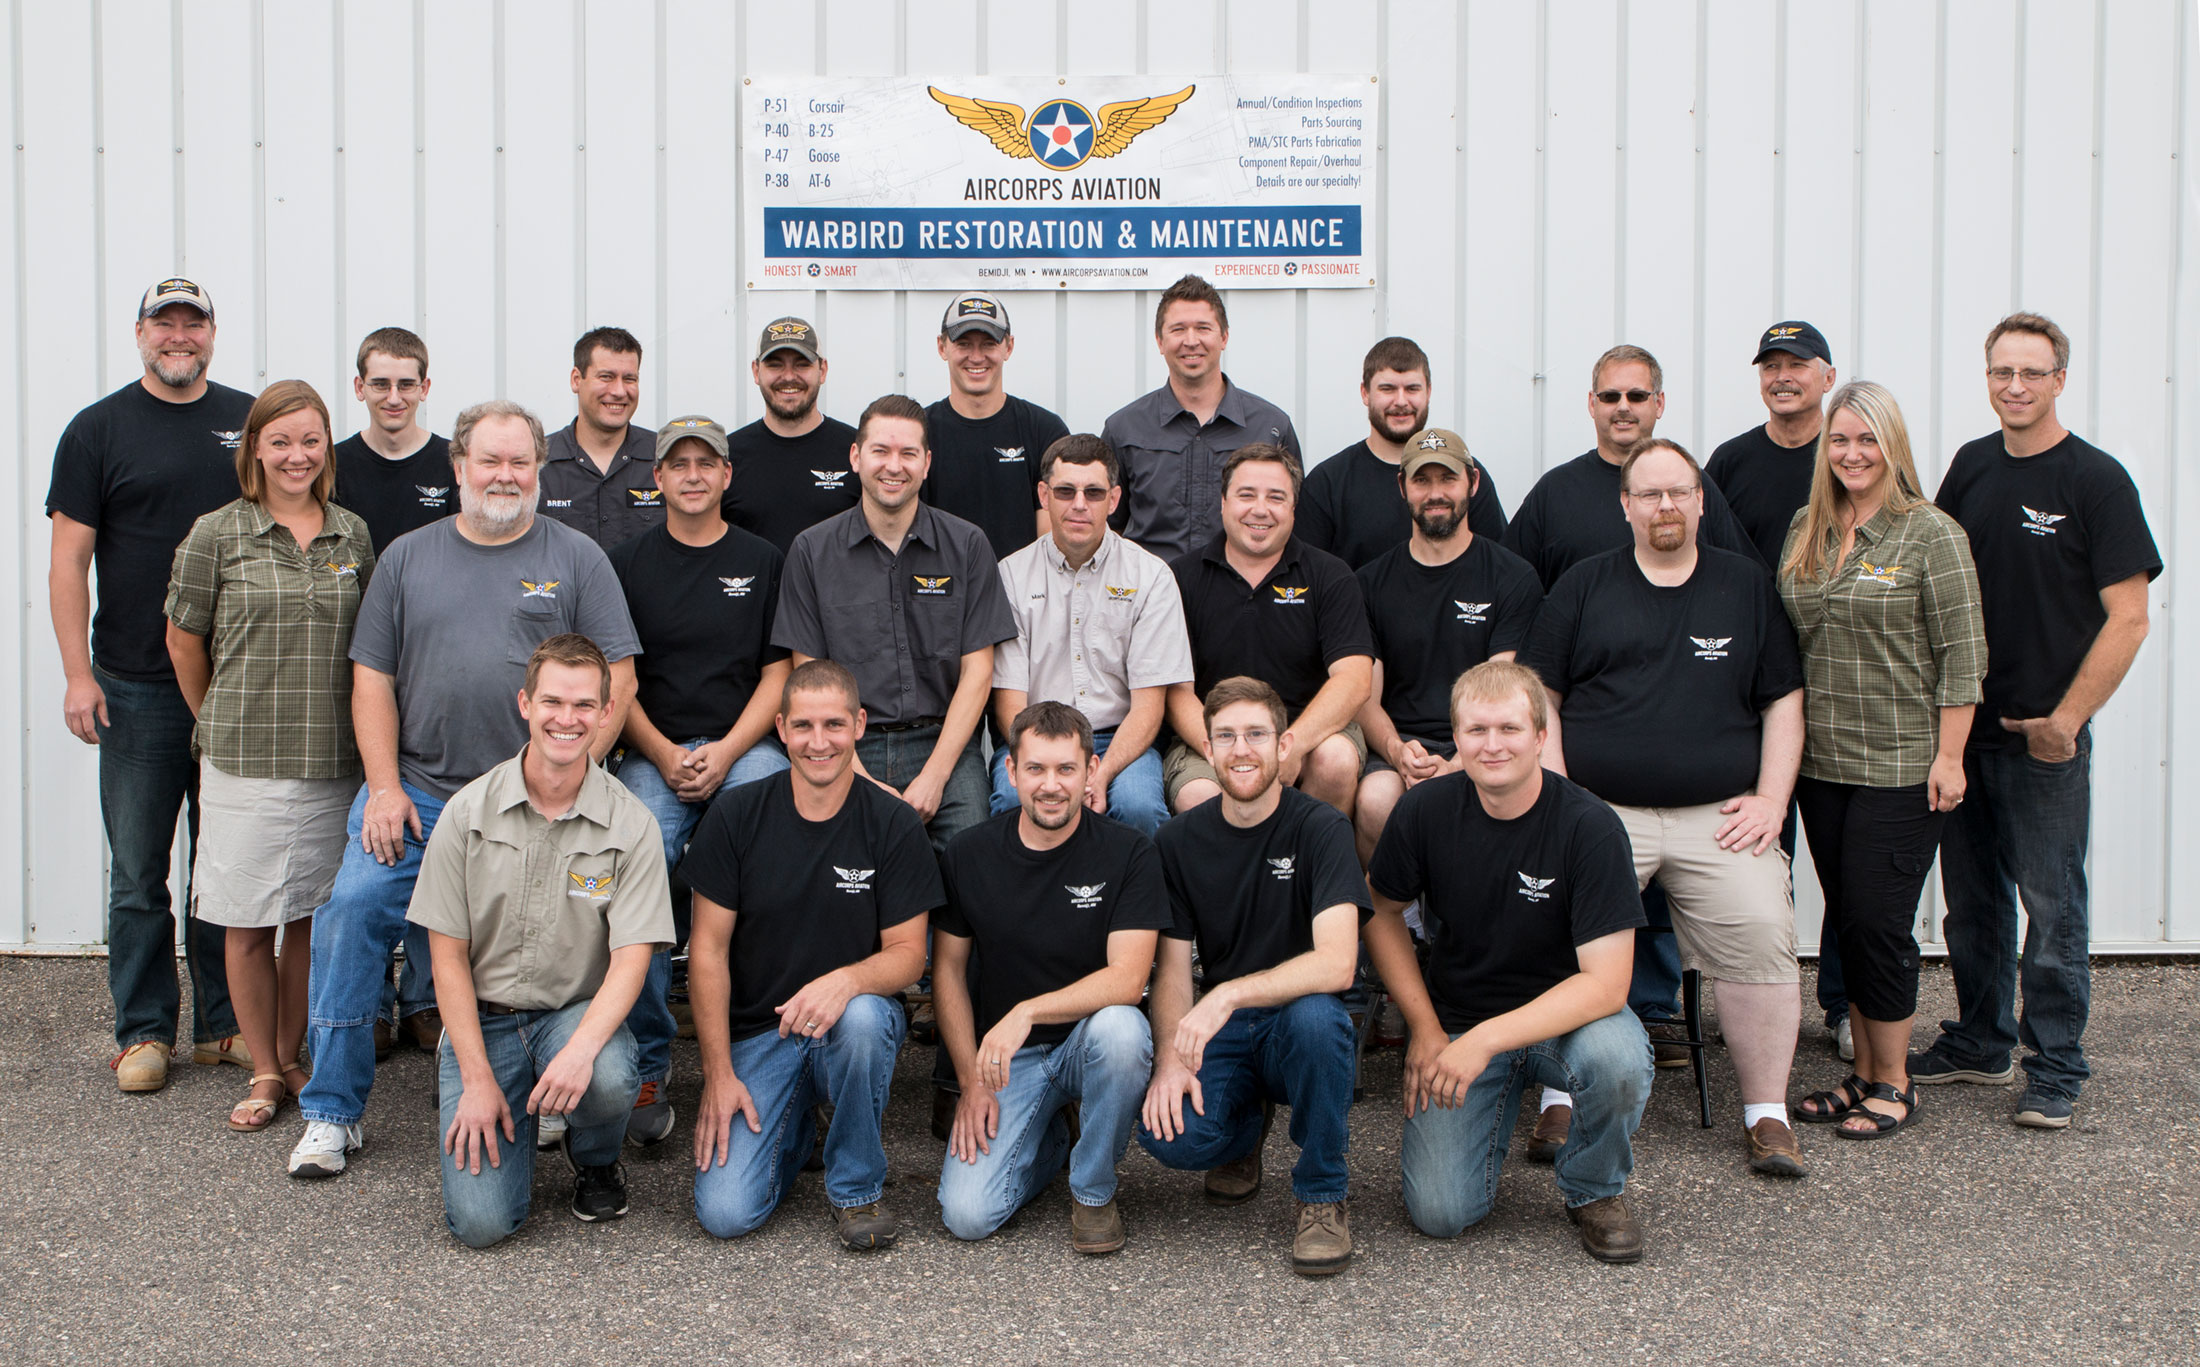 AirCorps Aviation Team 2016